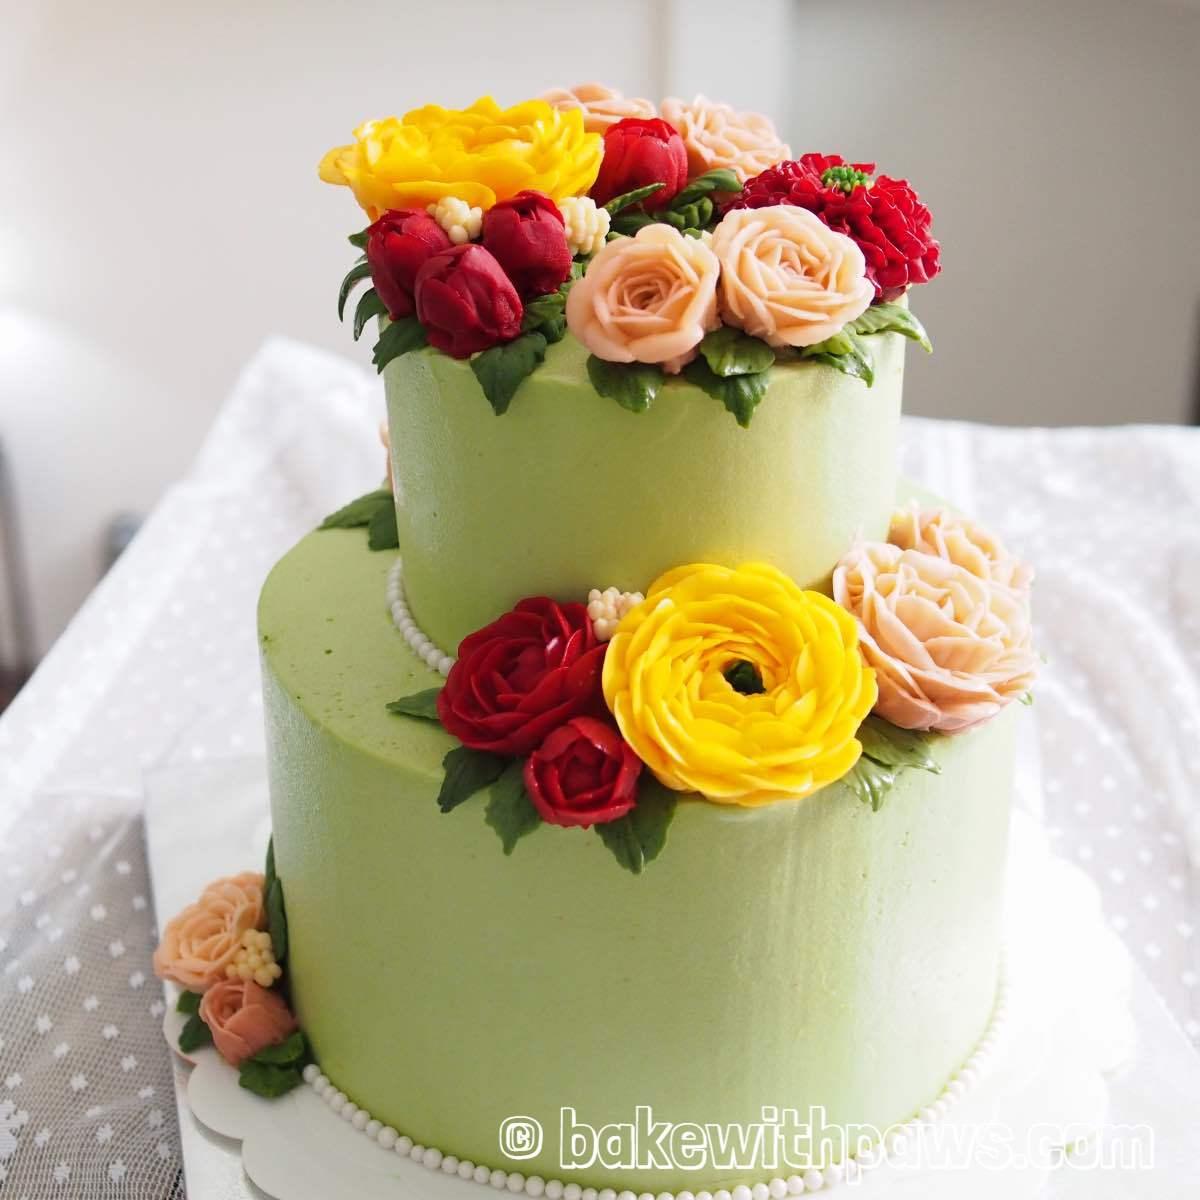 Korean Style Buttercream Flowers Cake - 27 - BAKE WITH PAWS